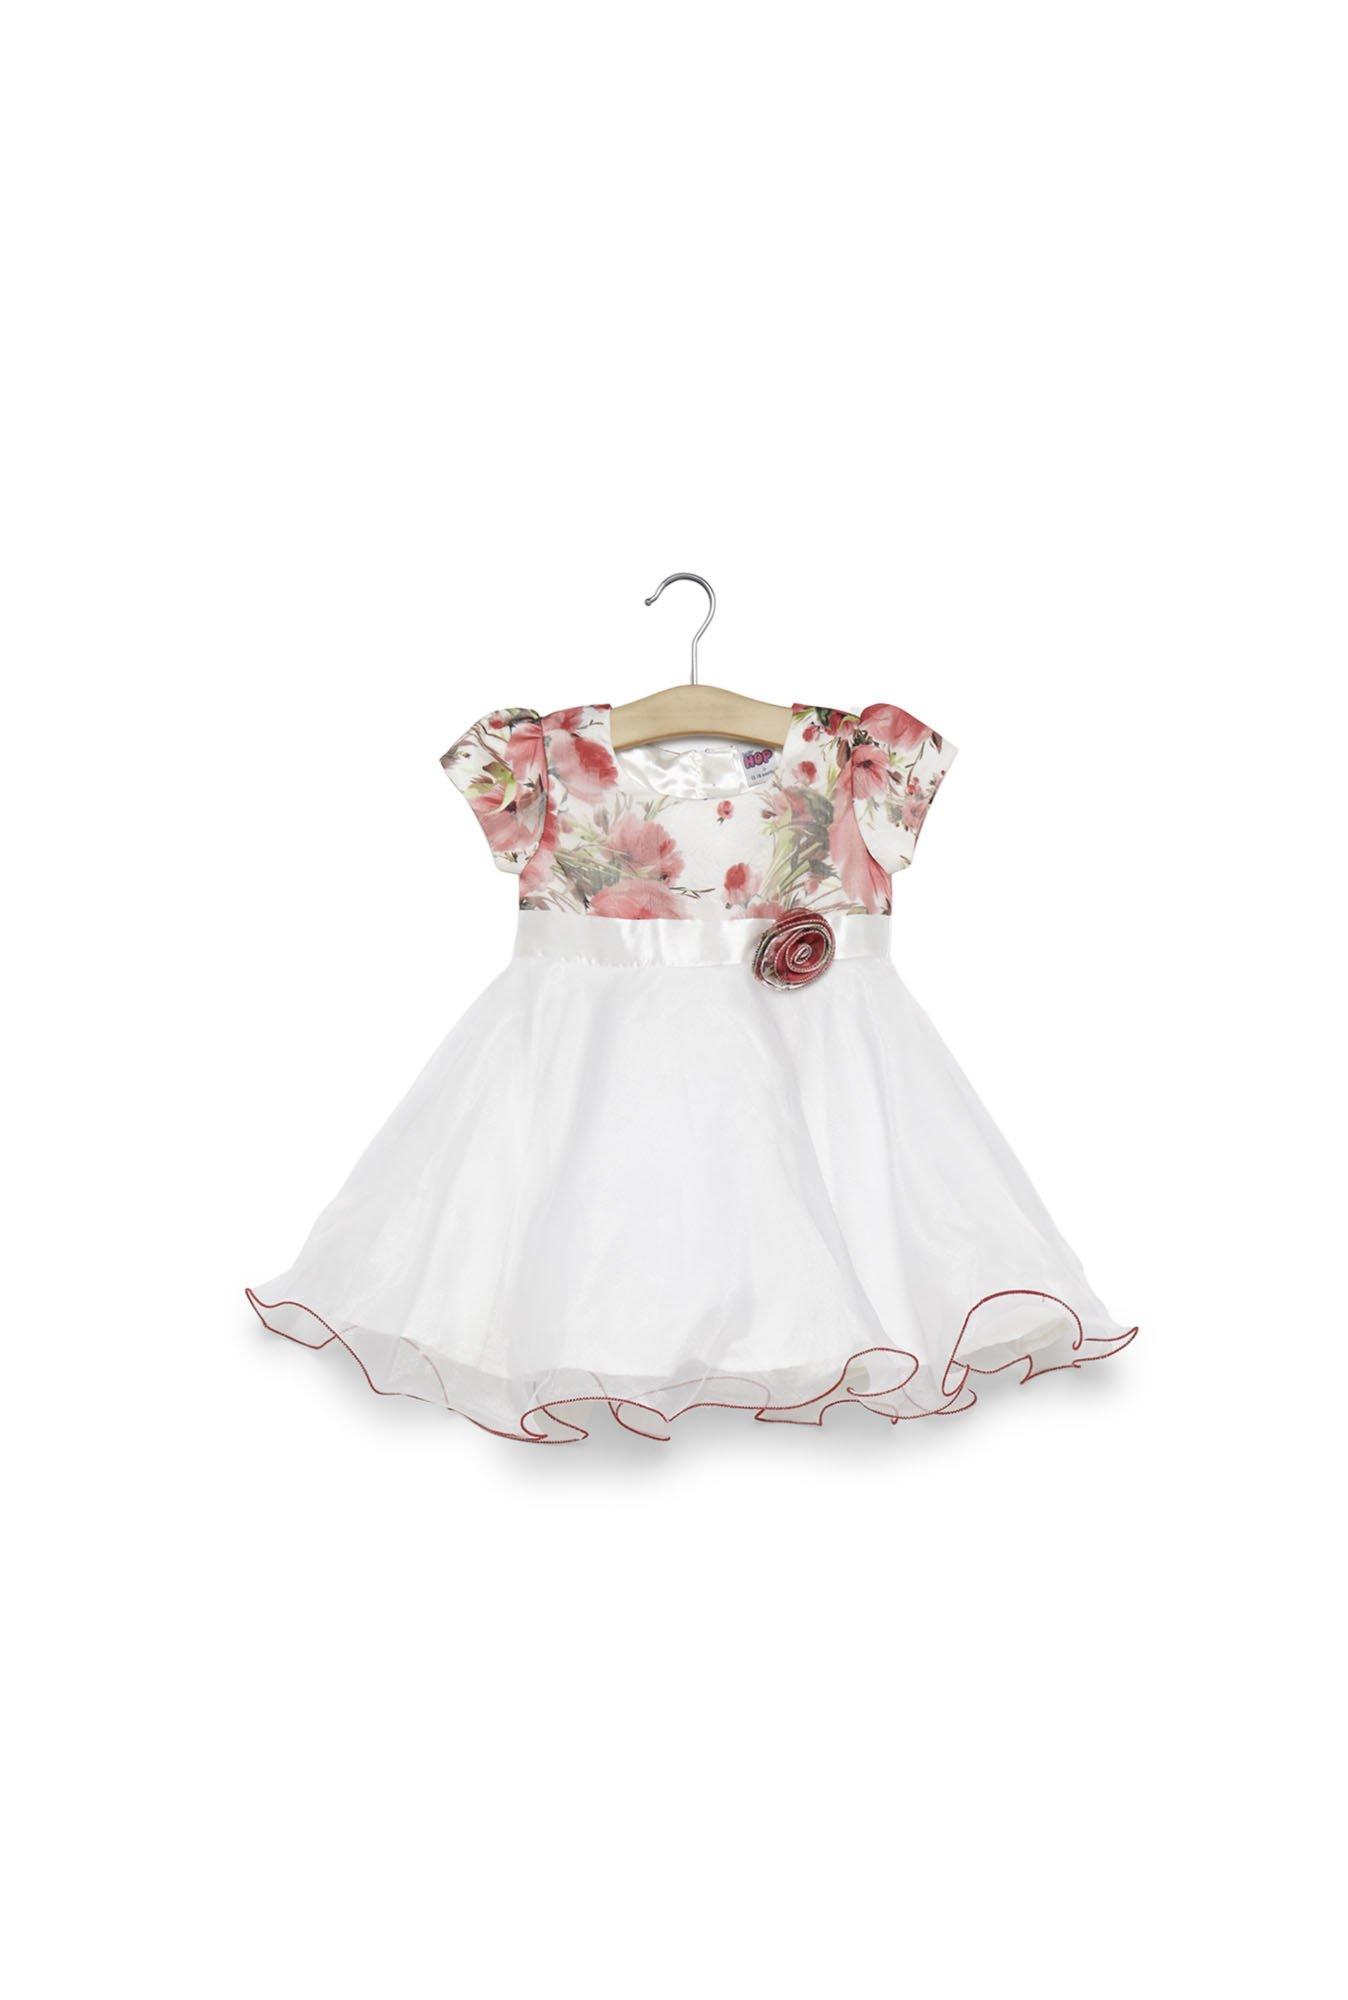 c248748004 Baby Dress- Buy Baby Dresses online in India - Myntra